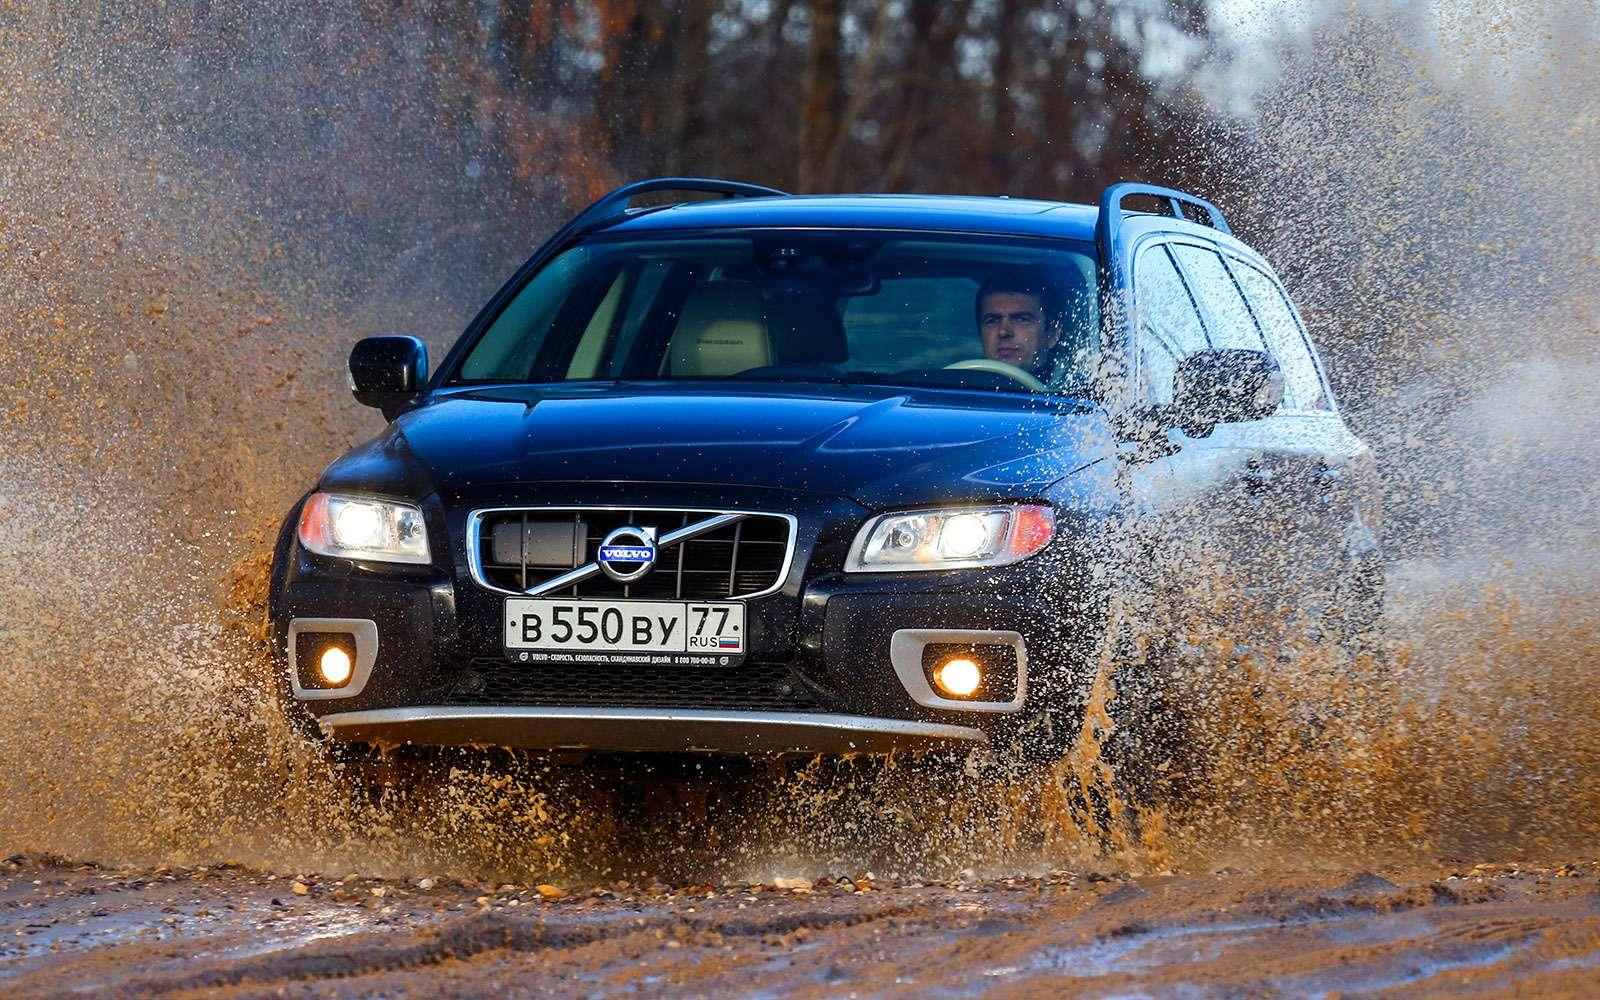 Шведская династия: Volvo V90 Cross Country нафоне предков— фото 776469